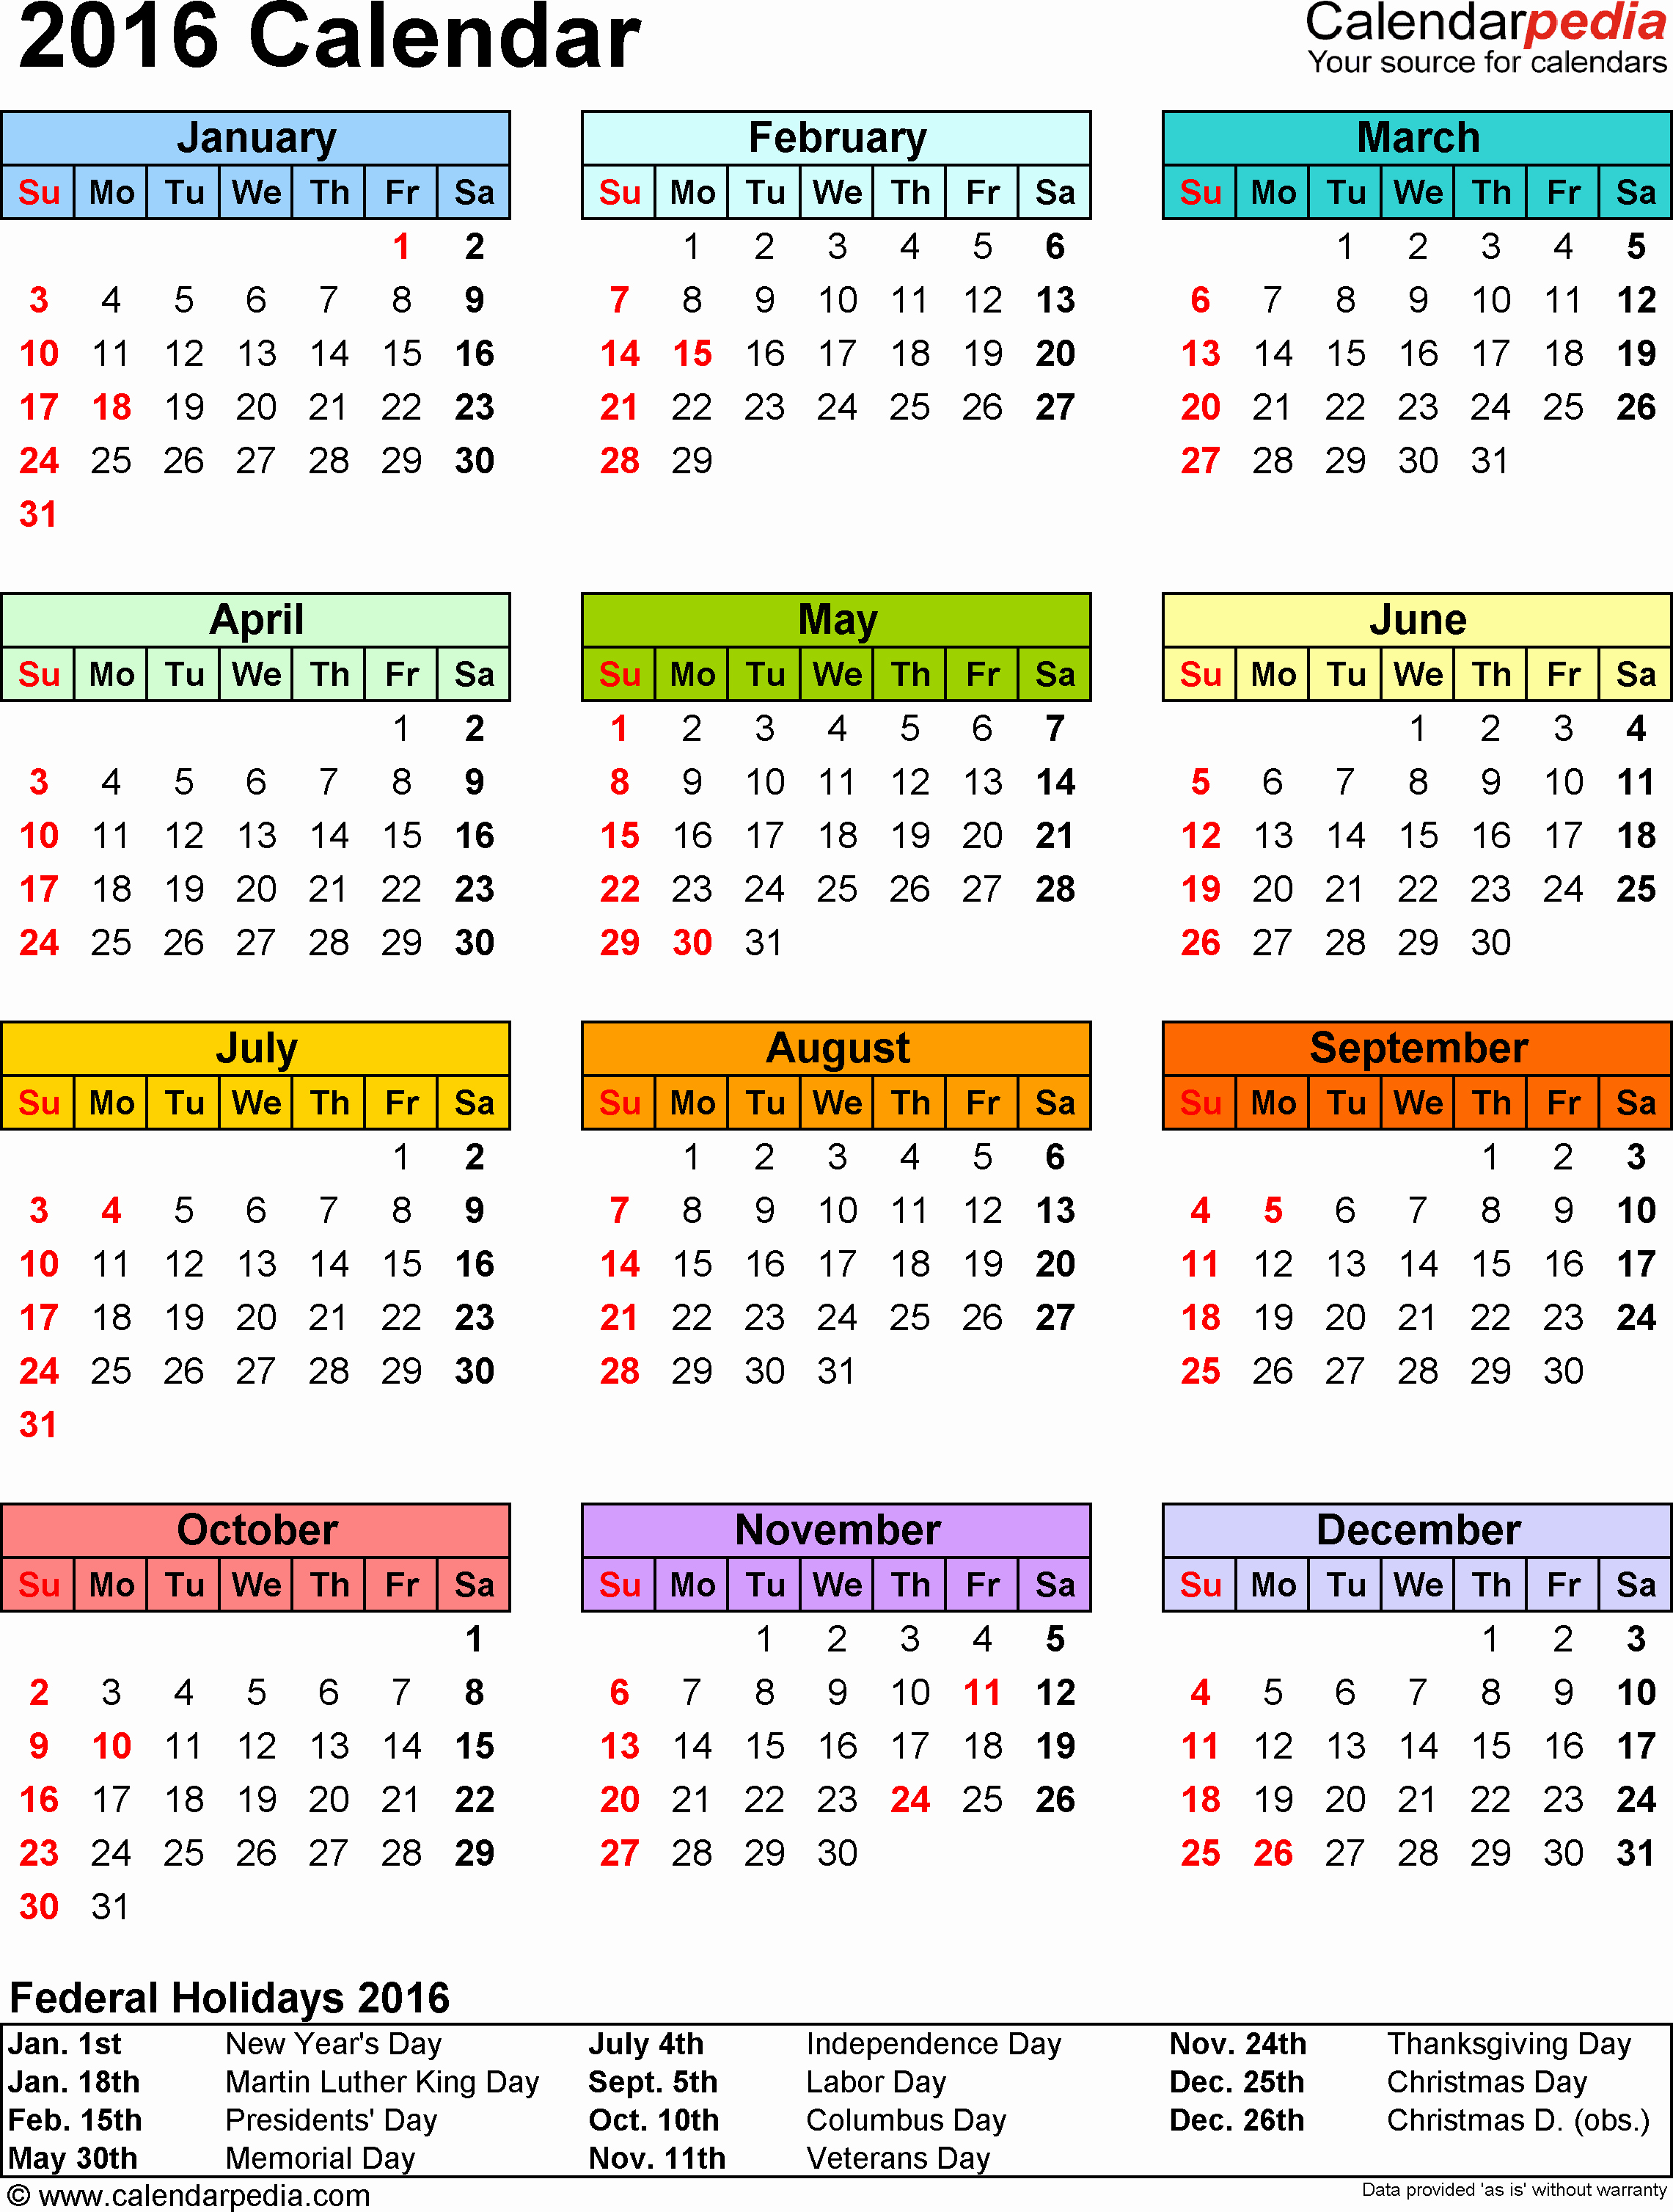 Free Year Calendar Template 2016 Lovely 2016 Calendar Pdf 16 Free Printable Calendar Templates